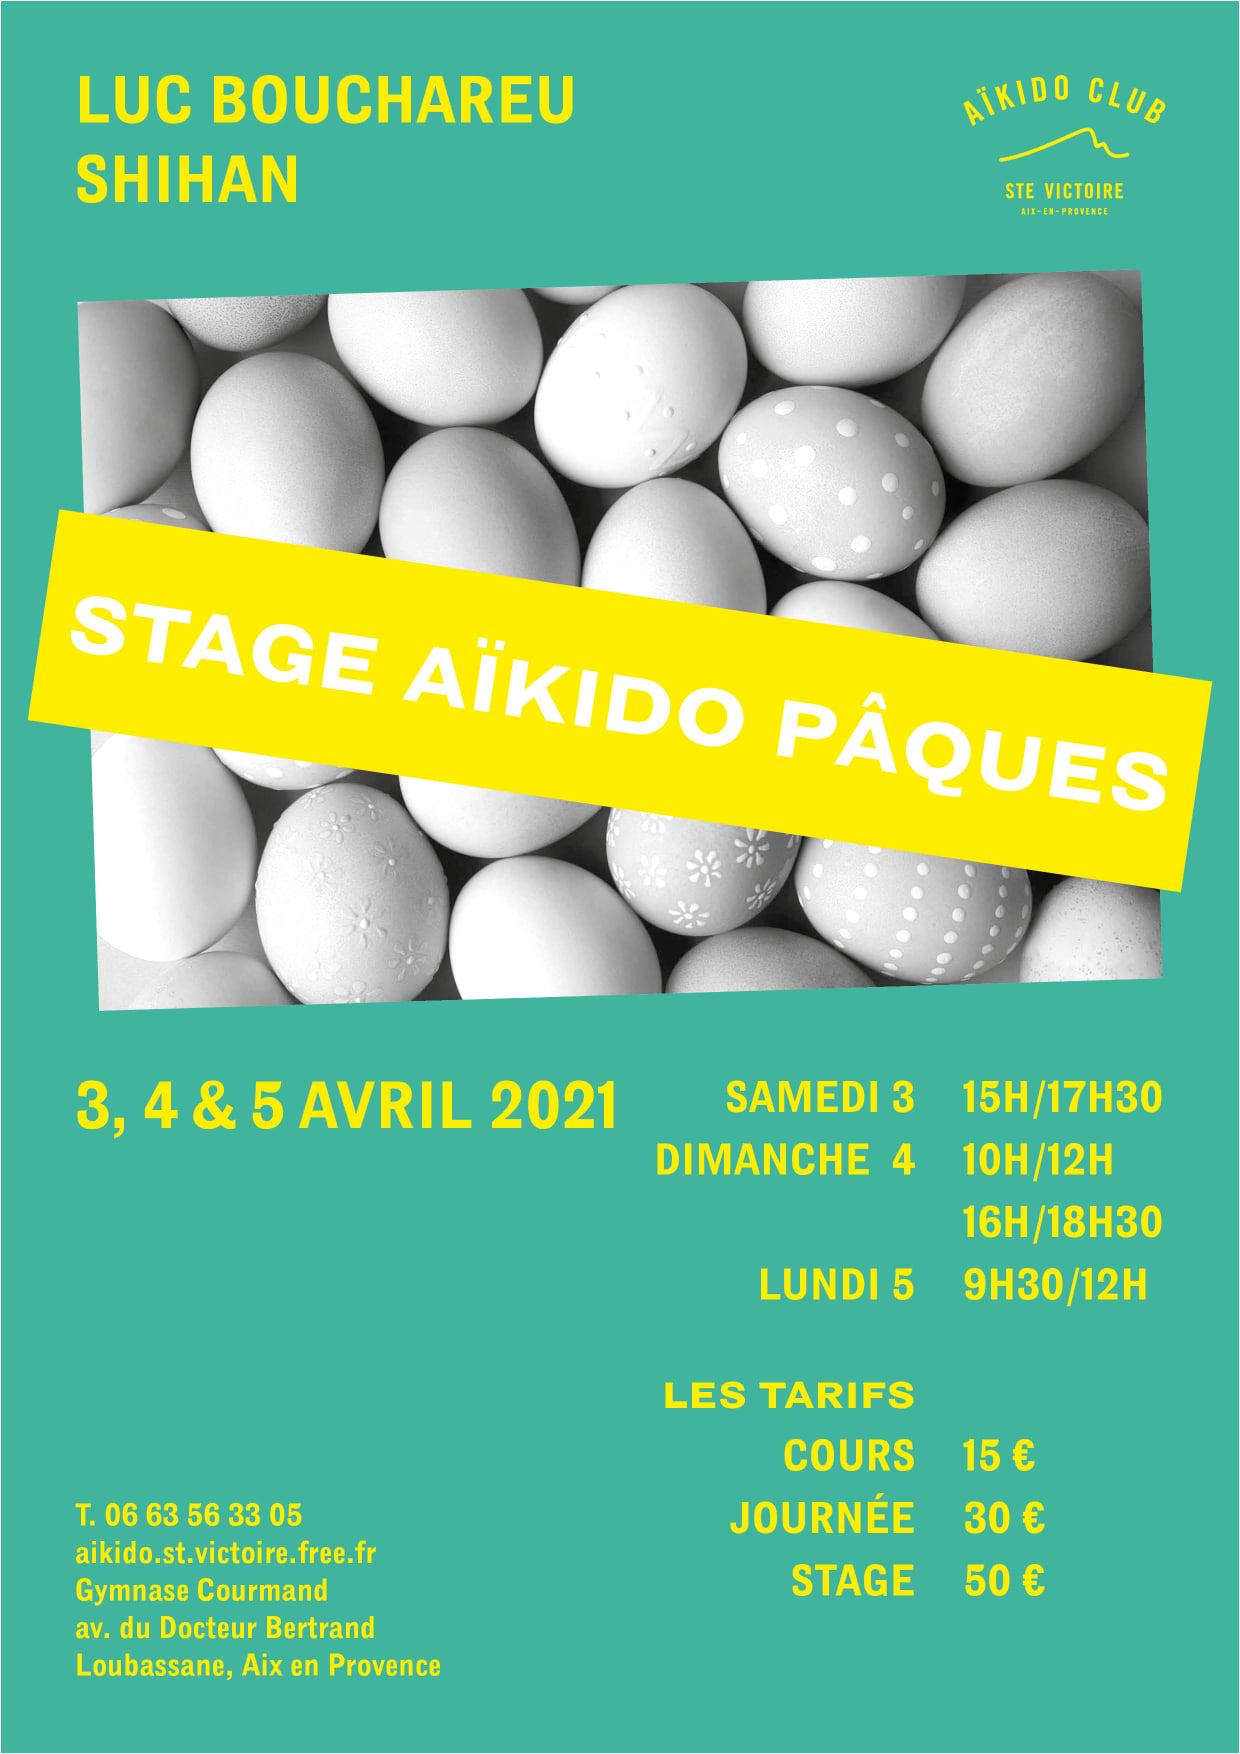 Stage de pâques 2021 Aix